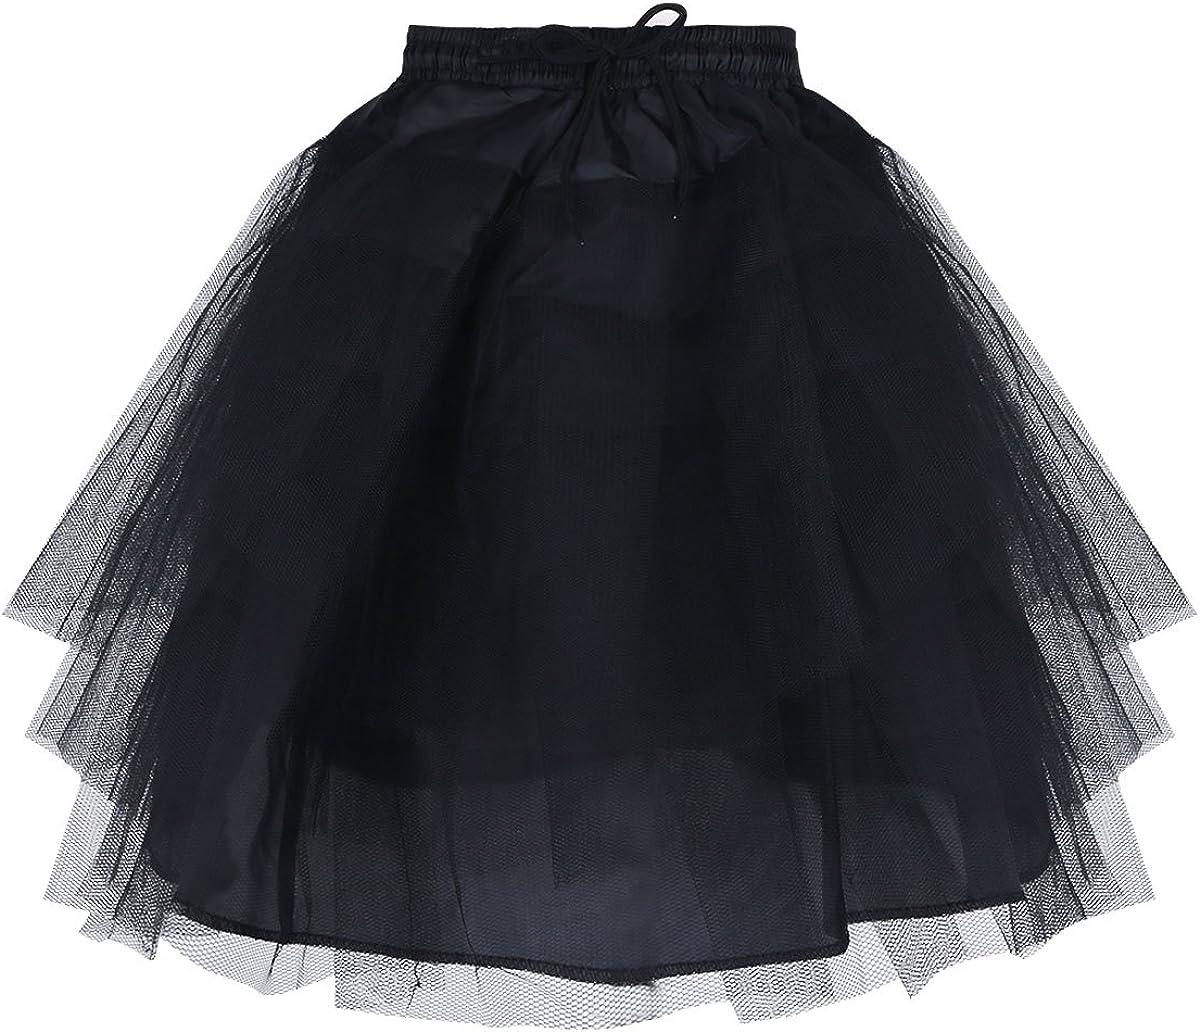 YONGHS Kids Hoopless Petticoat Crinoline Slip with 3 Layers Net Flower Girls Dress Wedding Pageant Tutu Underskirt